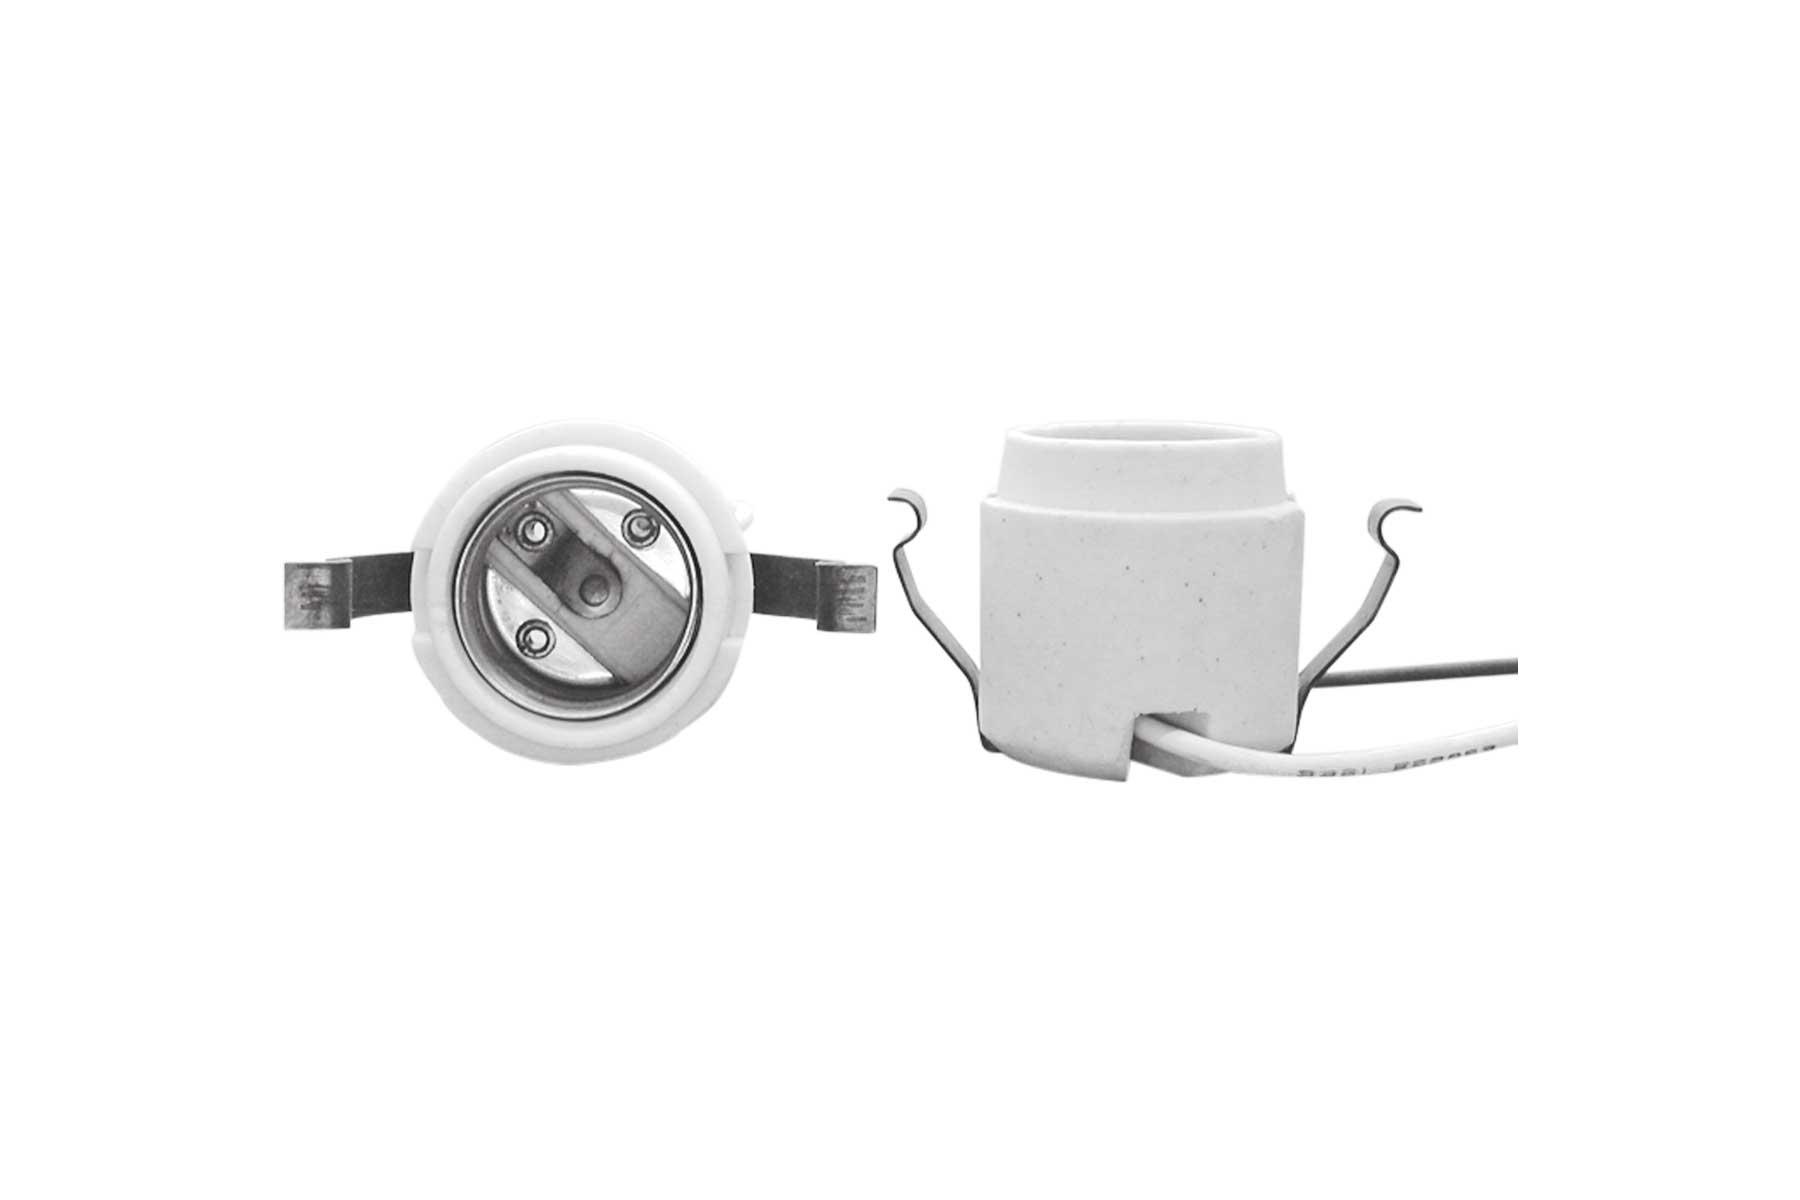 Medium Base Rear Mount Porcelain Keyless Incandescent Light Socket